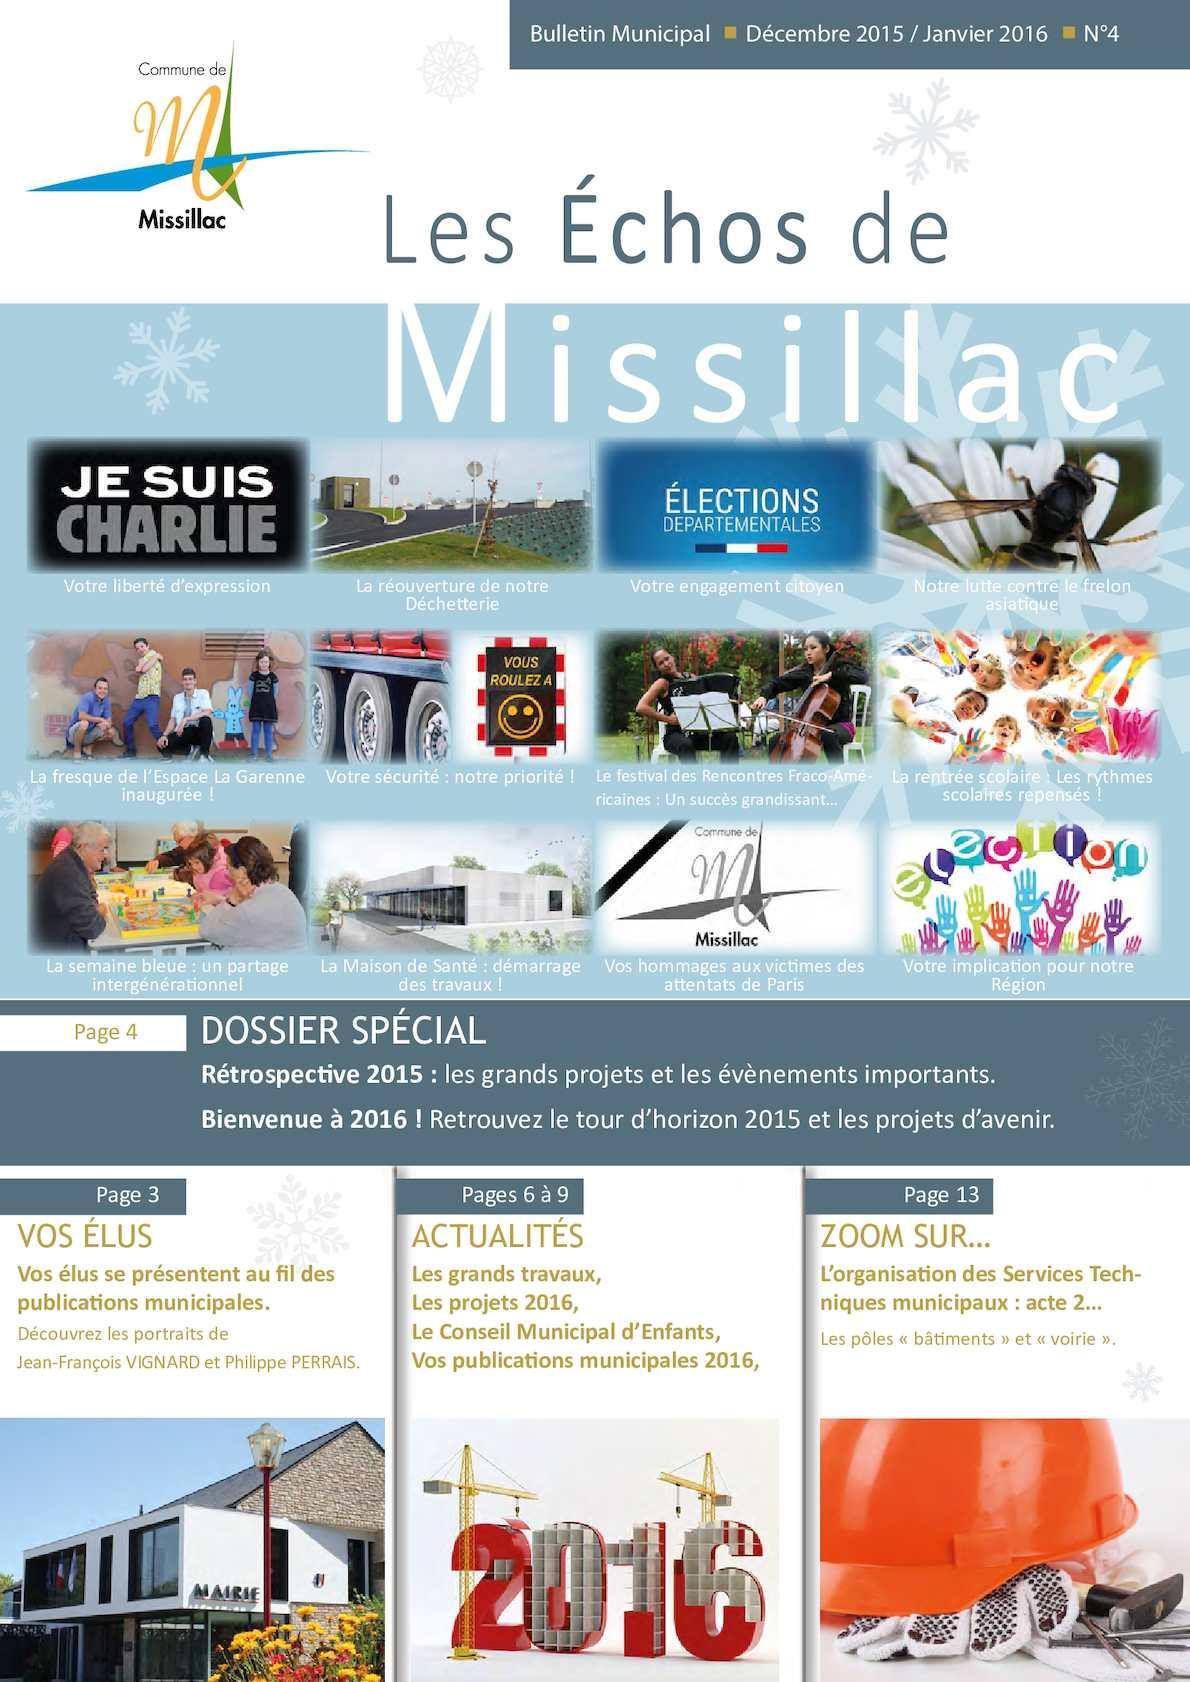 Calaméo - Bulletin Municipal Décembre 2015-Janvier 2016 db75635b5b1